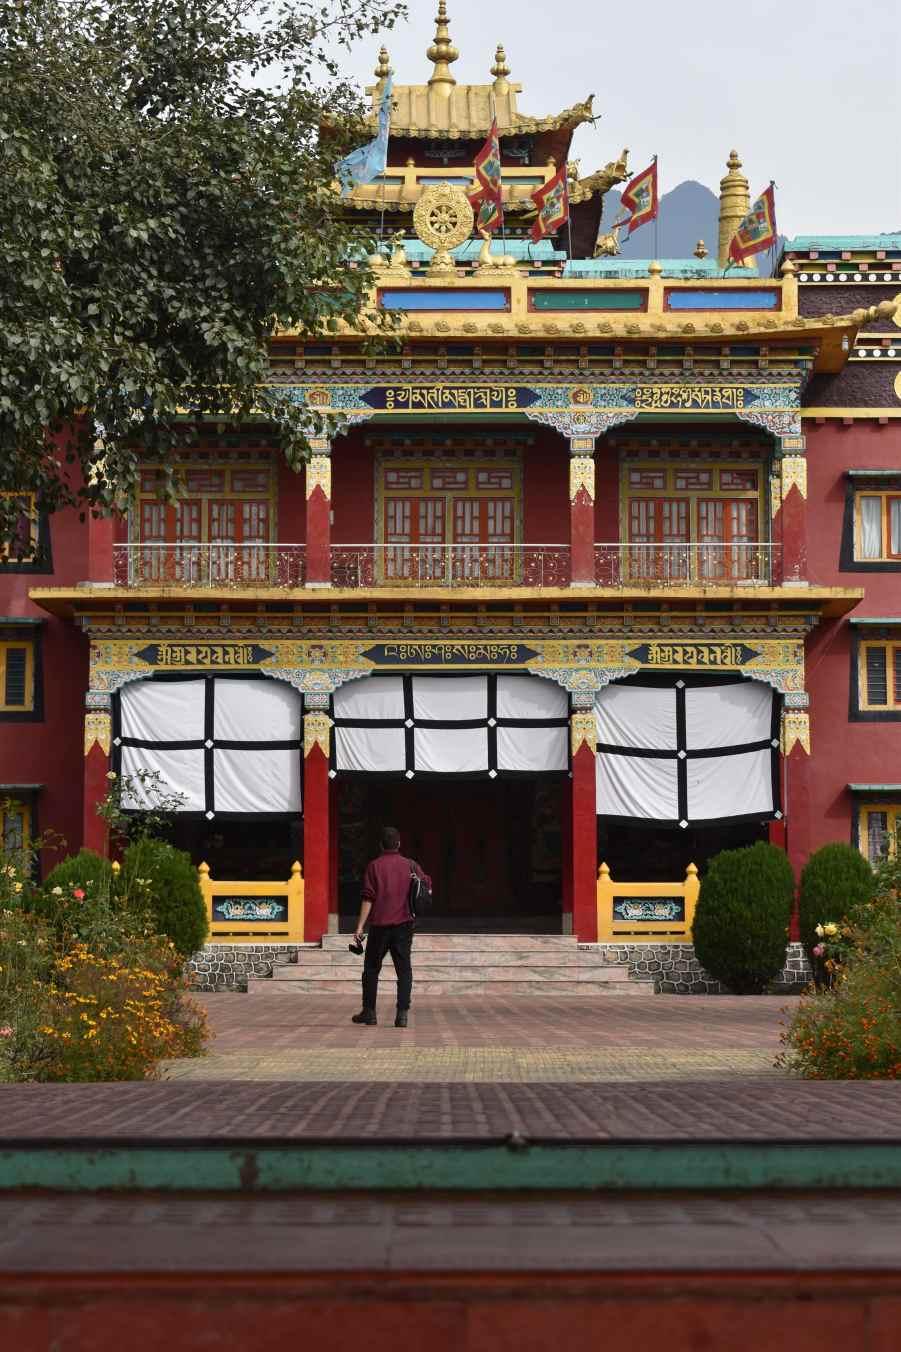 Chokling Monastery in-between tibatan market